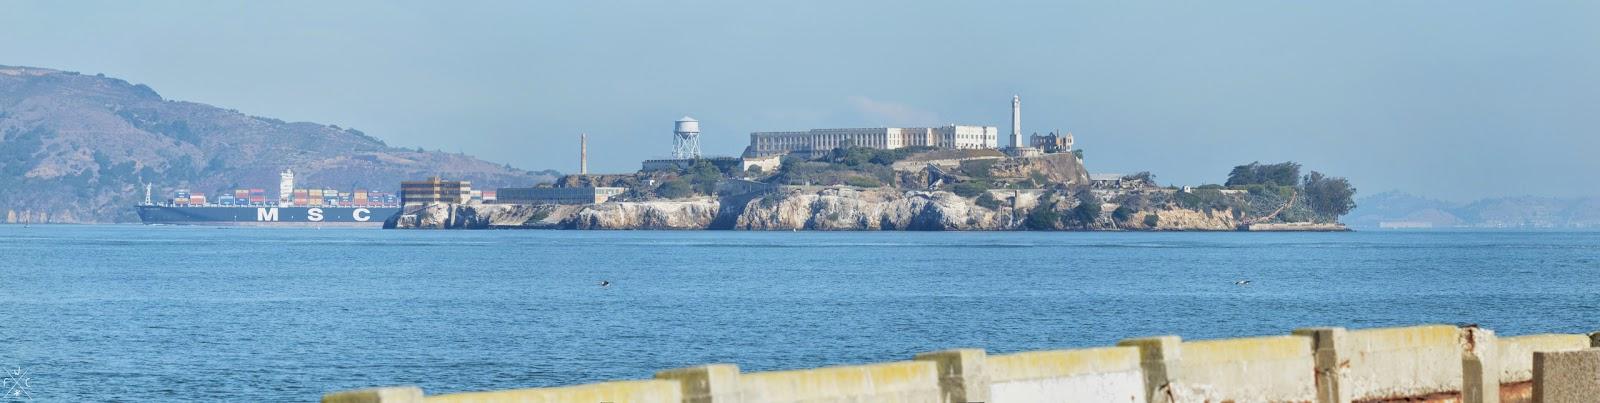 Alcatraz Island, San Francisco Bay, Californie, USA